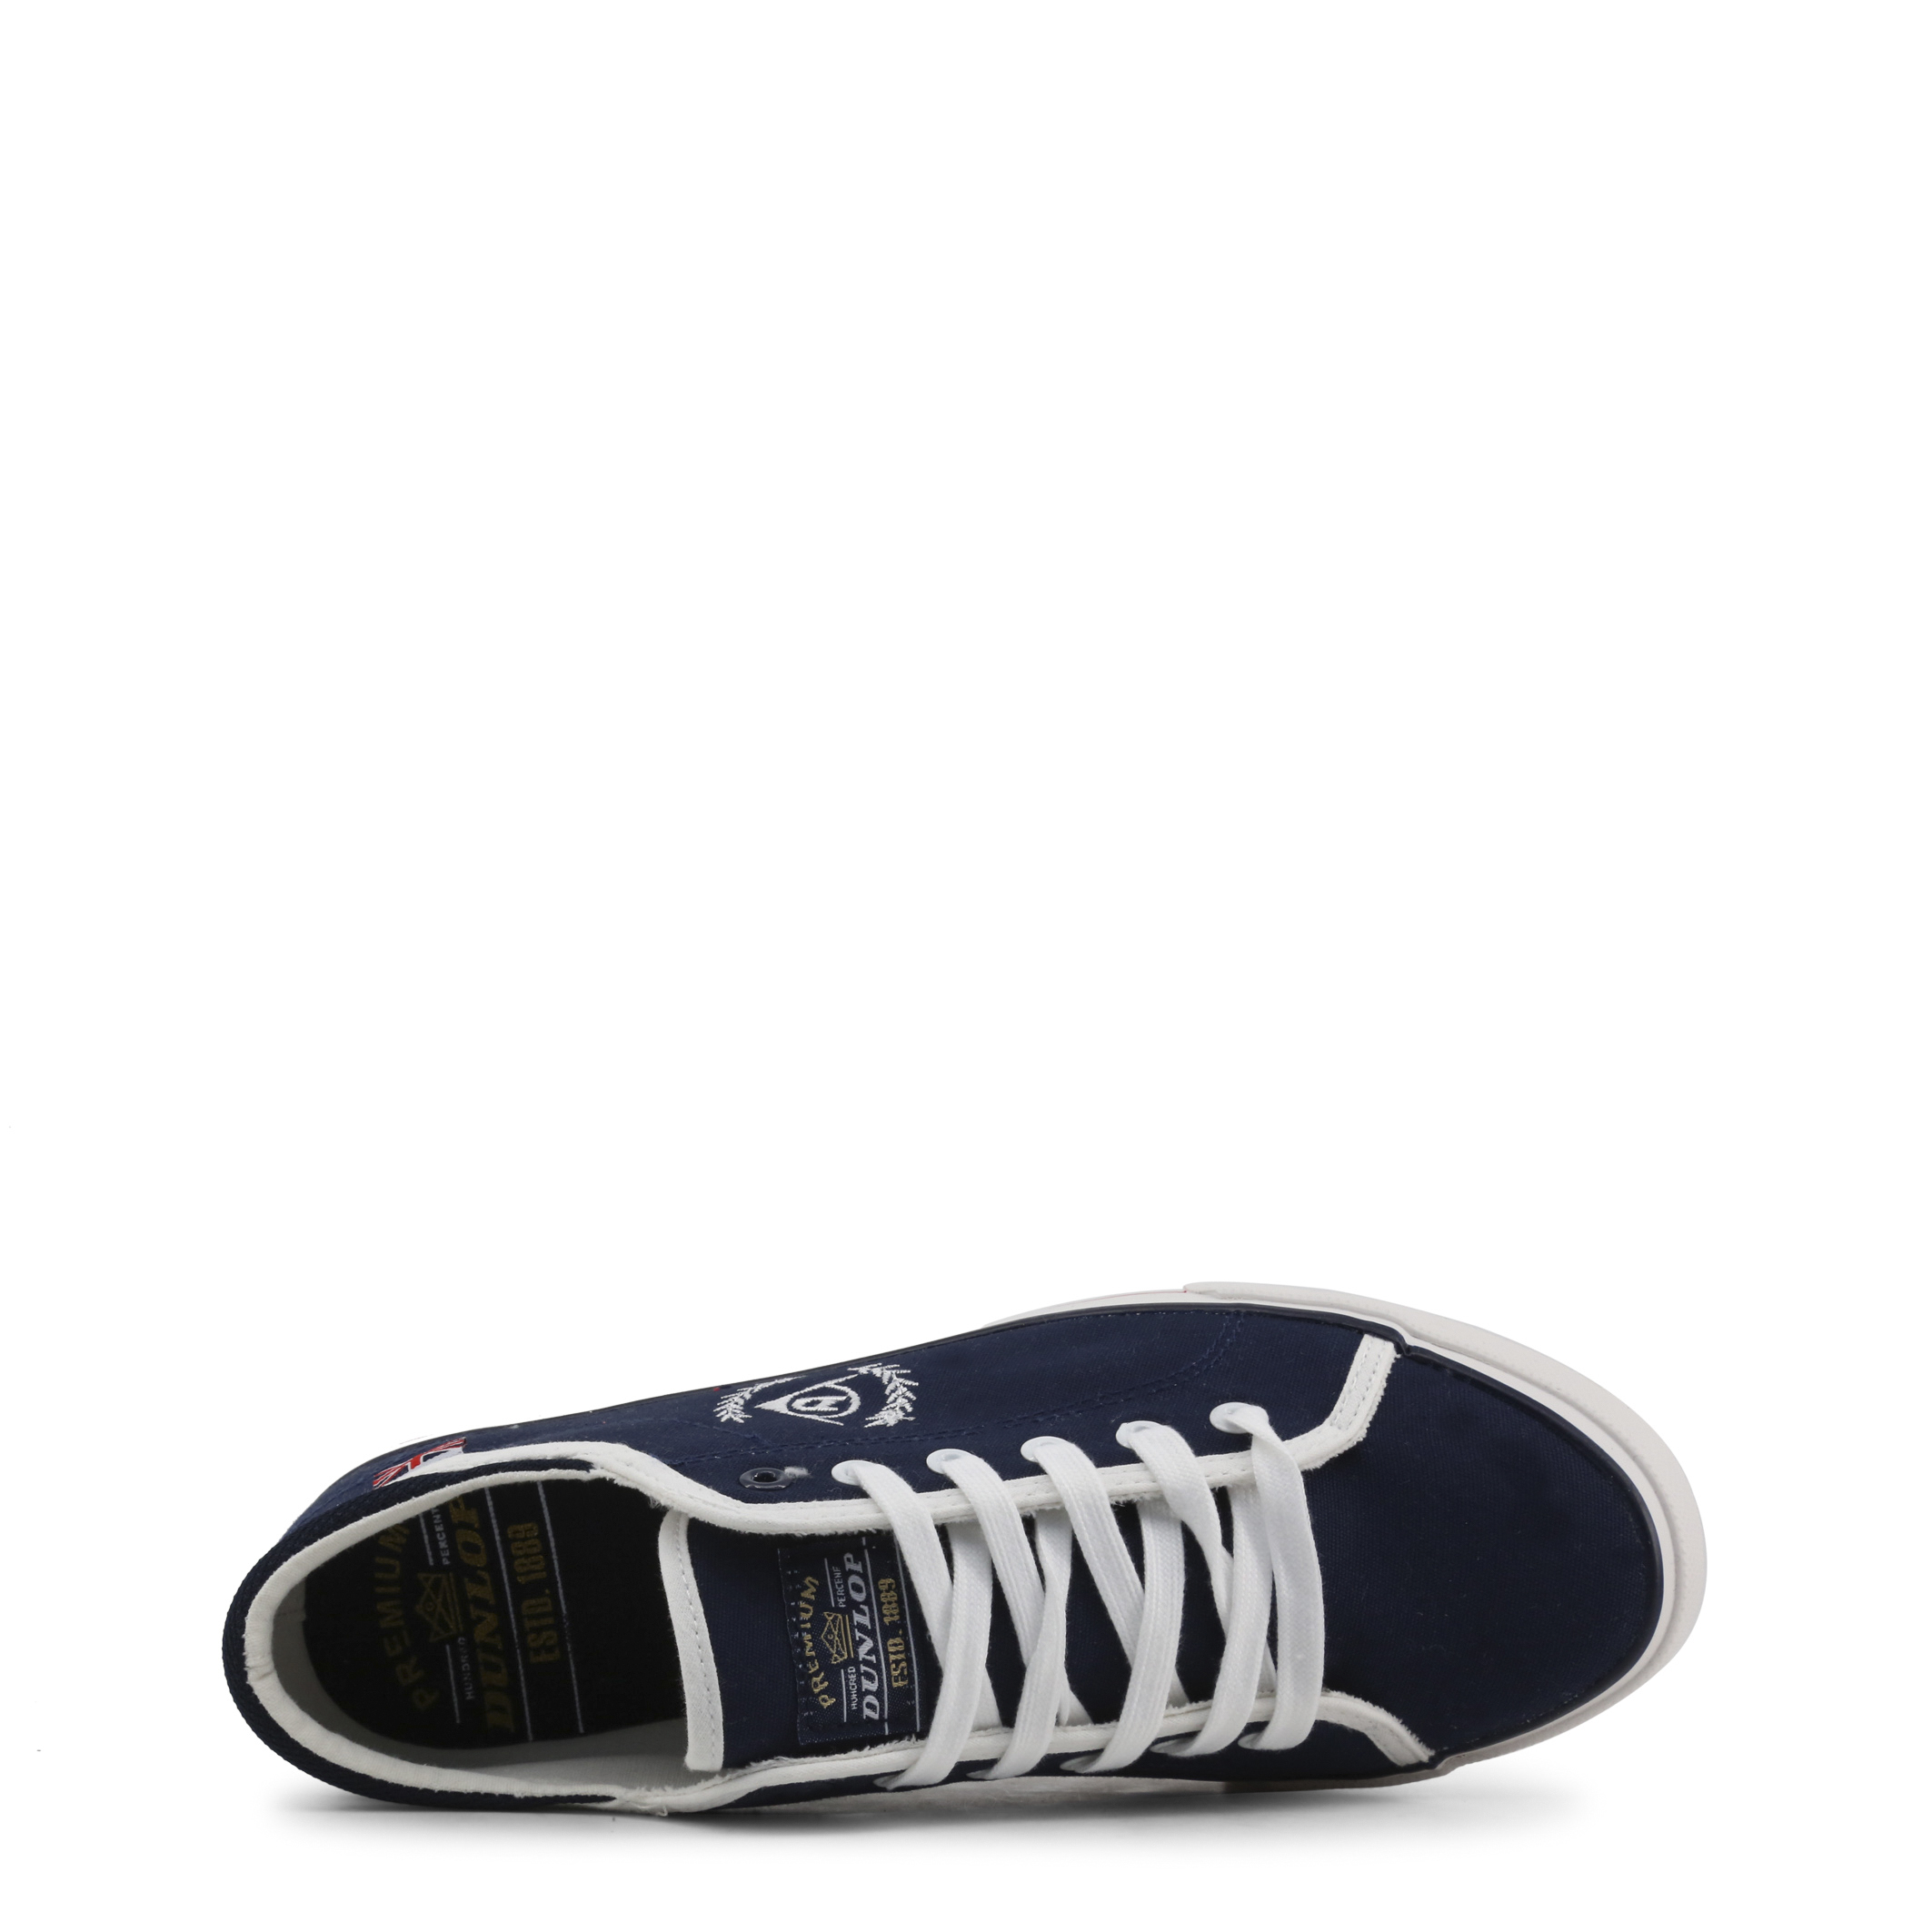 Chaussures de ville  Dunlop 35173 blue